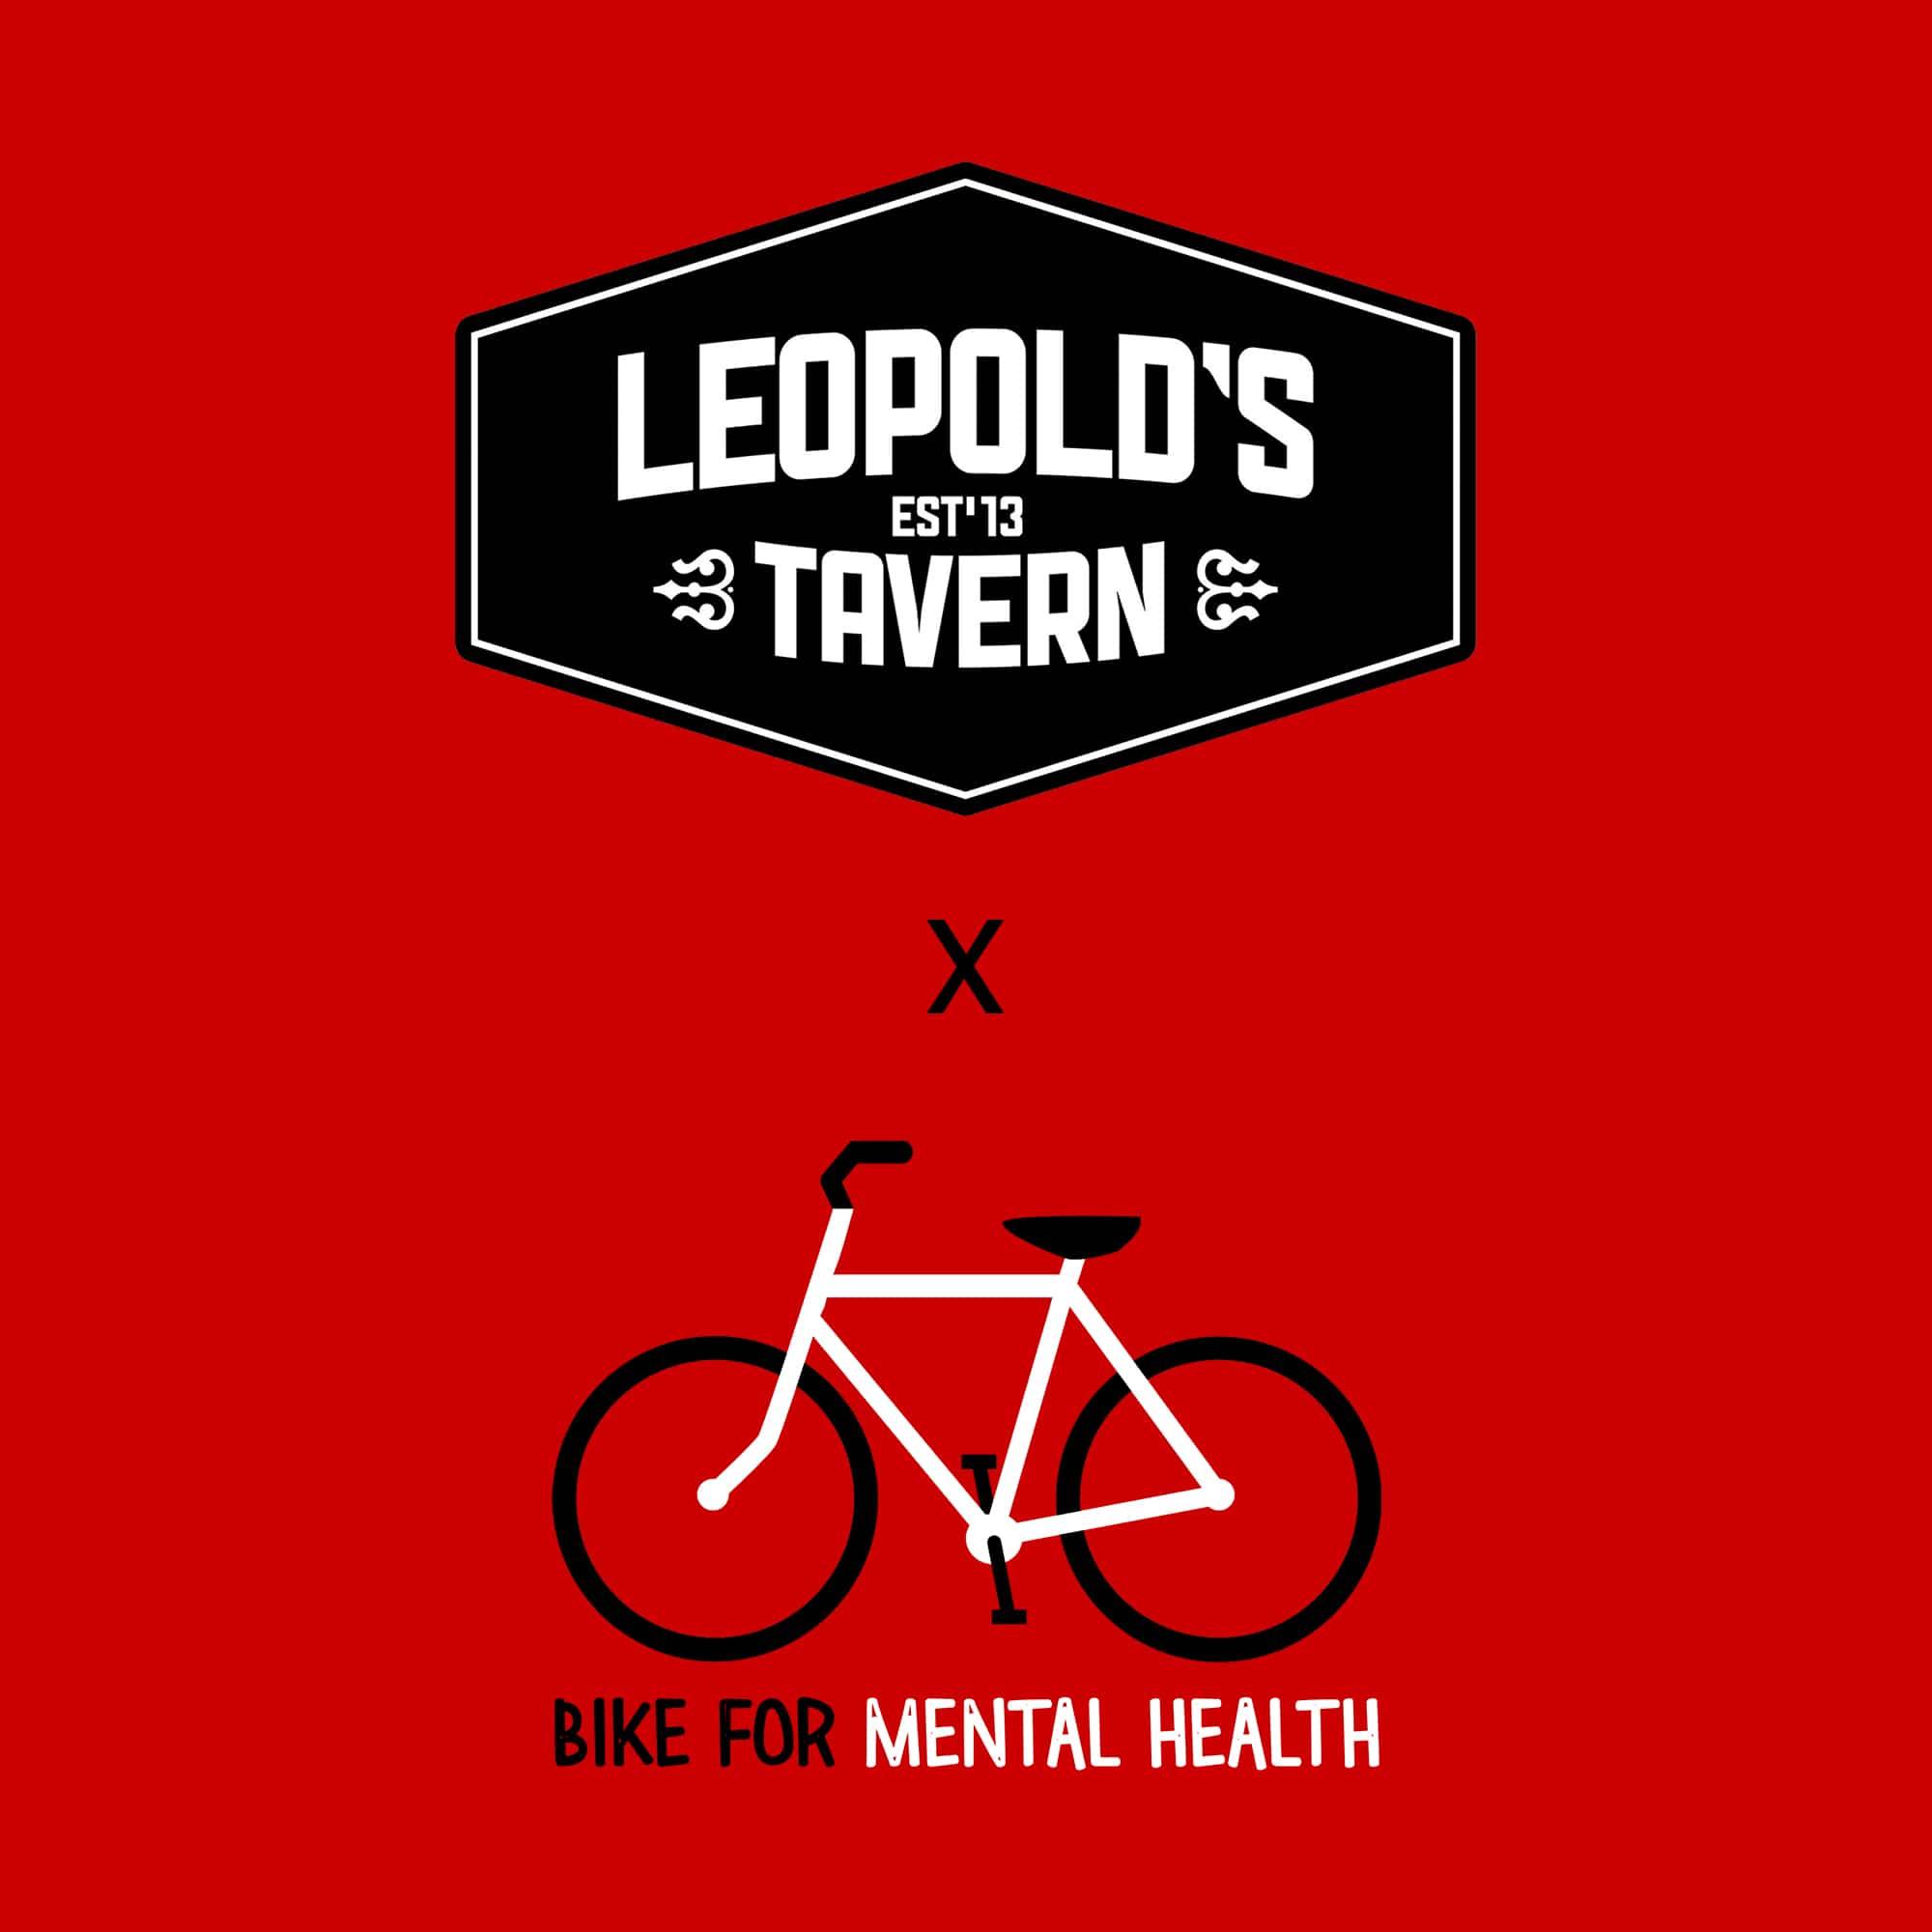 leos bike for mental health